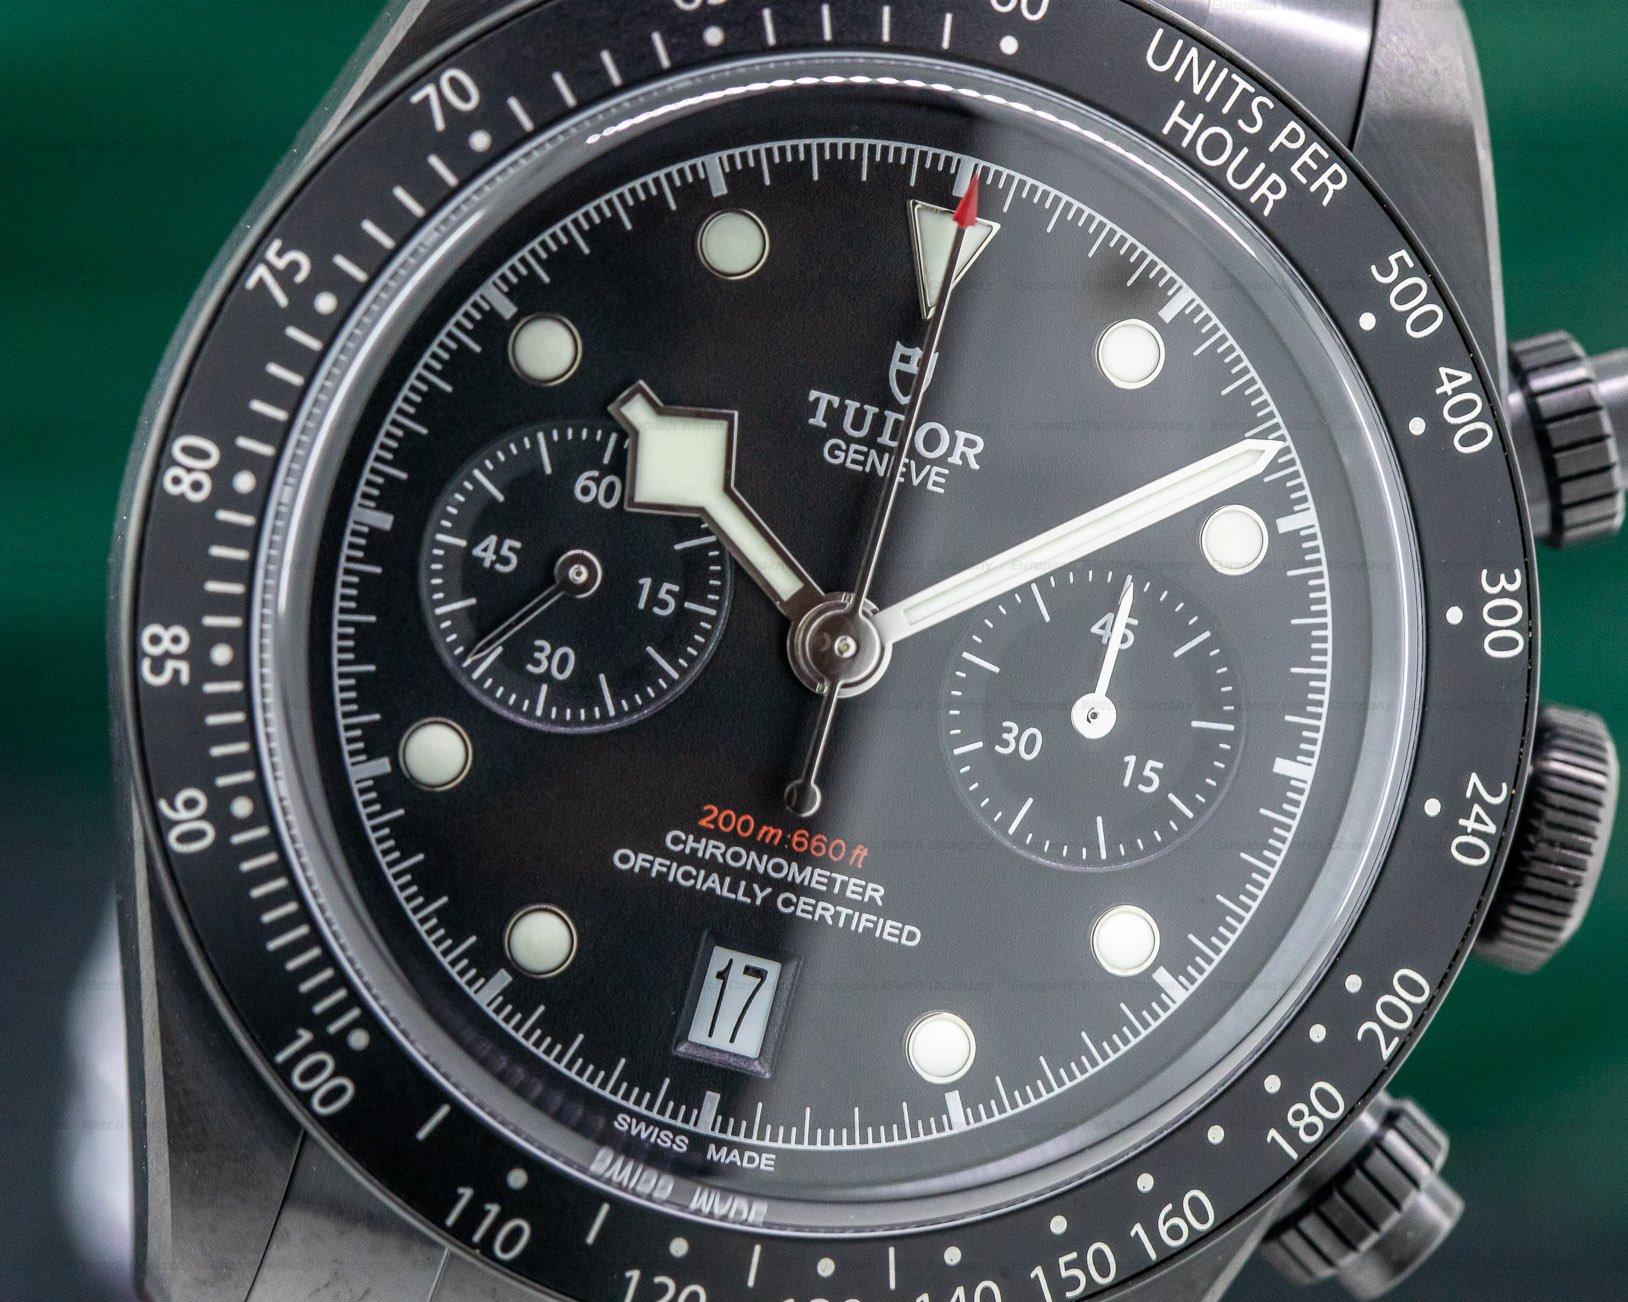 Tudor 79360DK Tudor Heritage Black Bay Chronograph Dark LIMITED